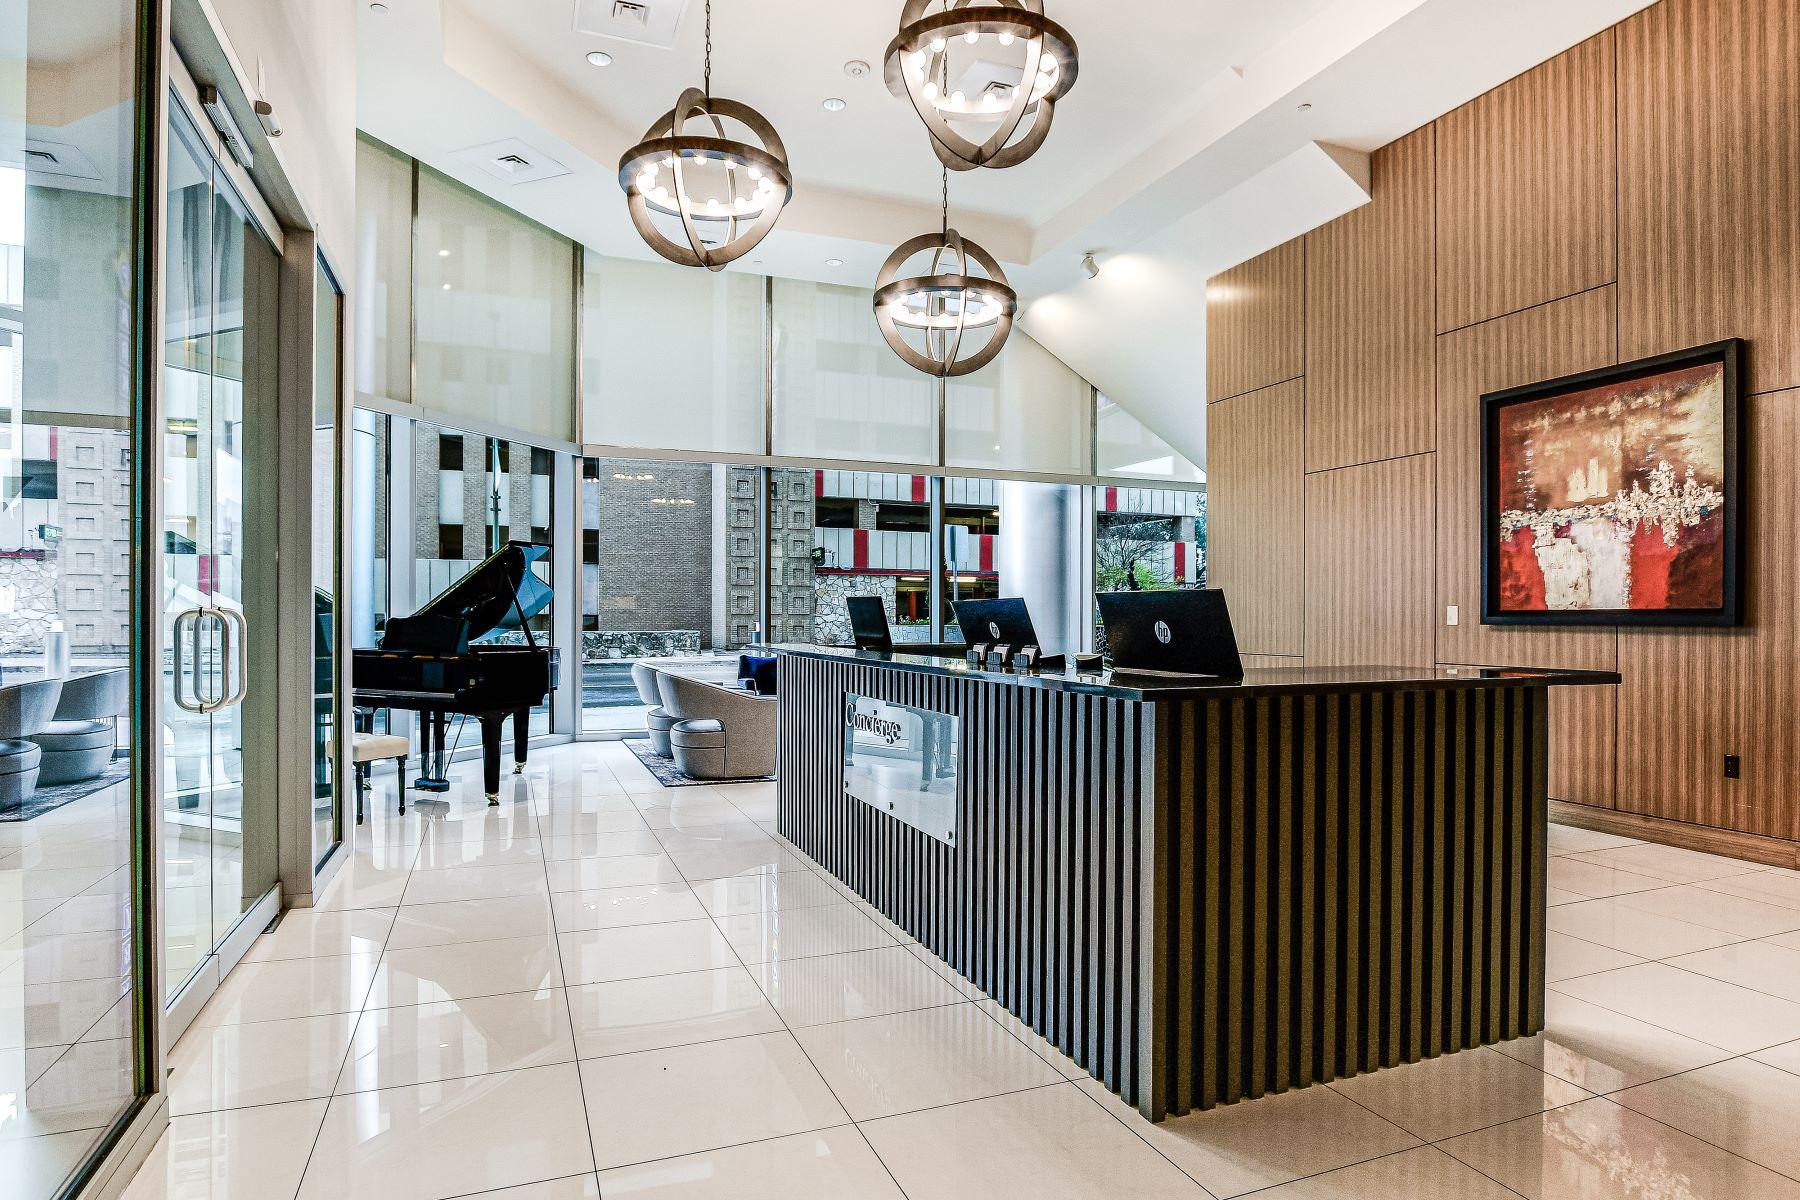 Condominiums 为 销售 在 Rare Opportunity at Alteza 600 East Market Street #3114 圣安东尼奥, 得克萨斯州 78205 美国